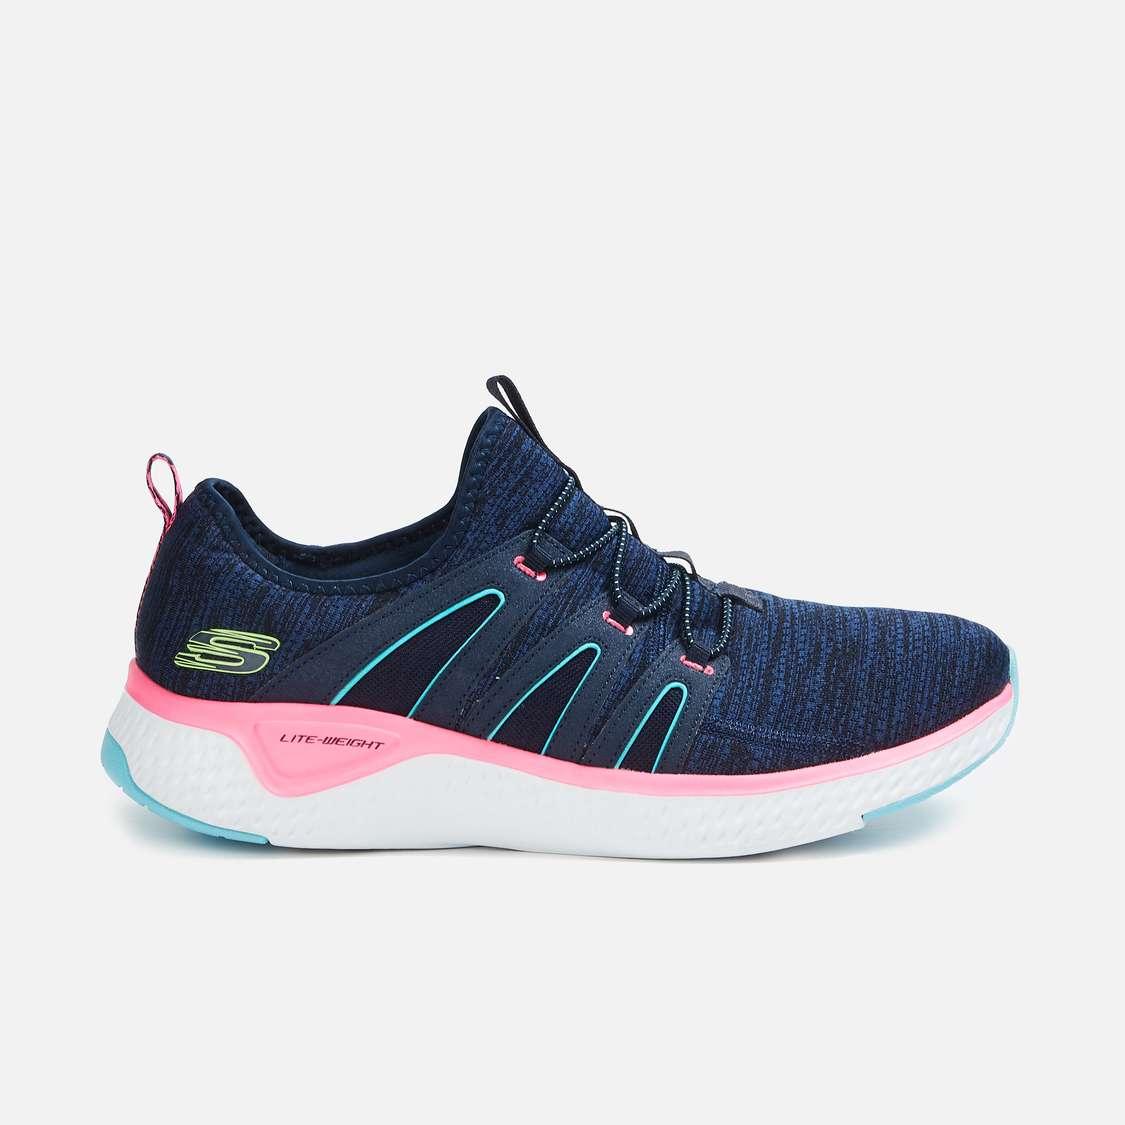 SKECHERS Women Mesh Lace-Up Sports Shoes